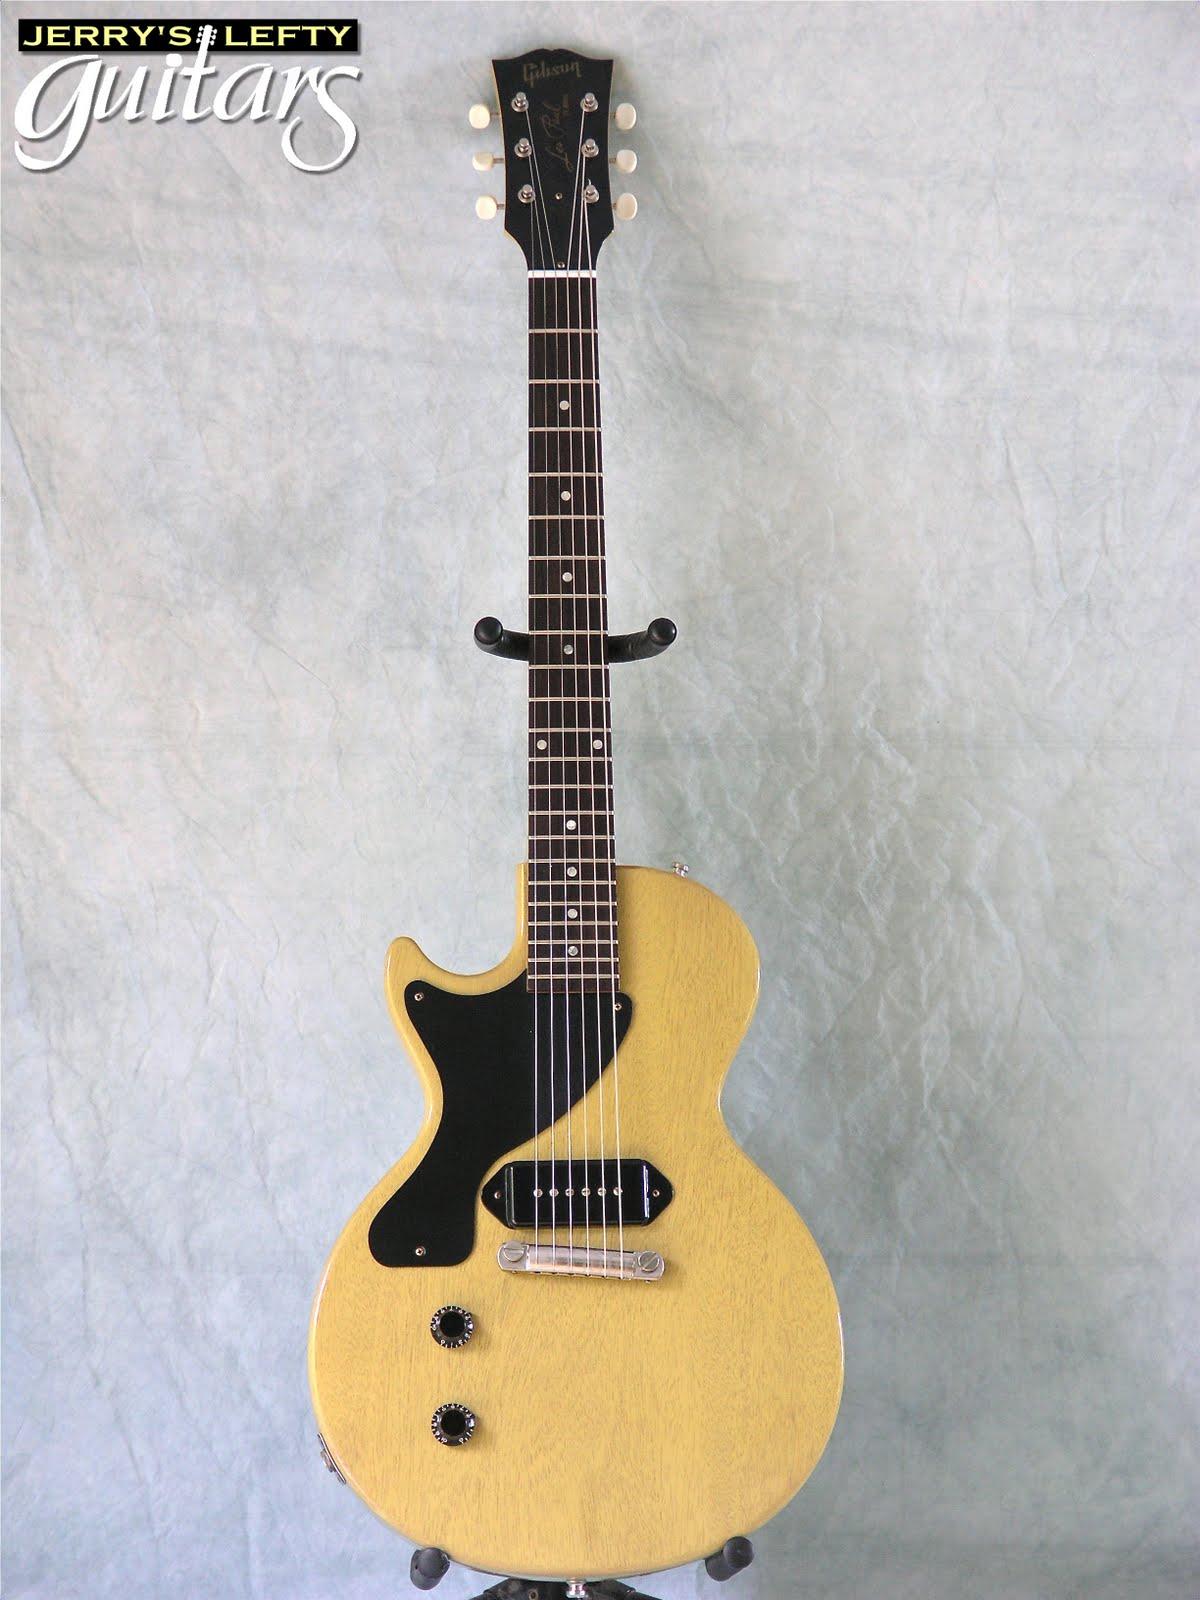 jerry 39 s lefty guitars newest guitar arrivals updated weekly gibson les paul jr custom shop. Black Bedroom Furniture Sets. Home Design Ideas